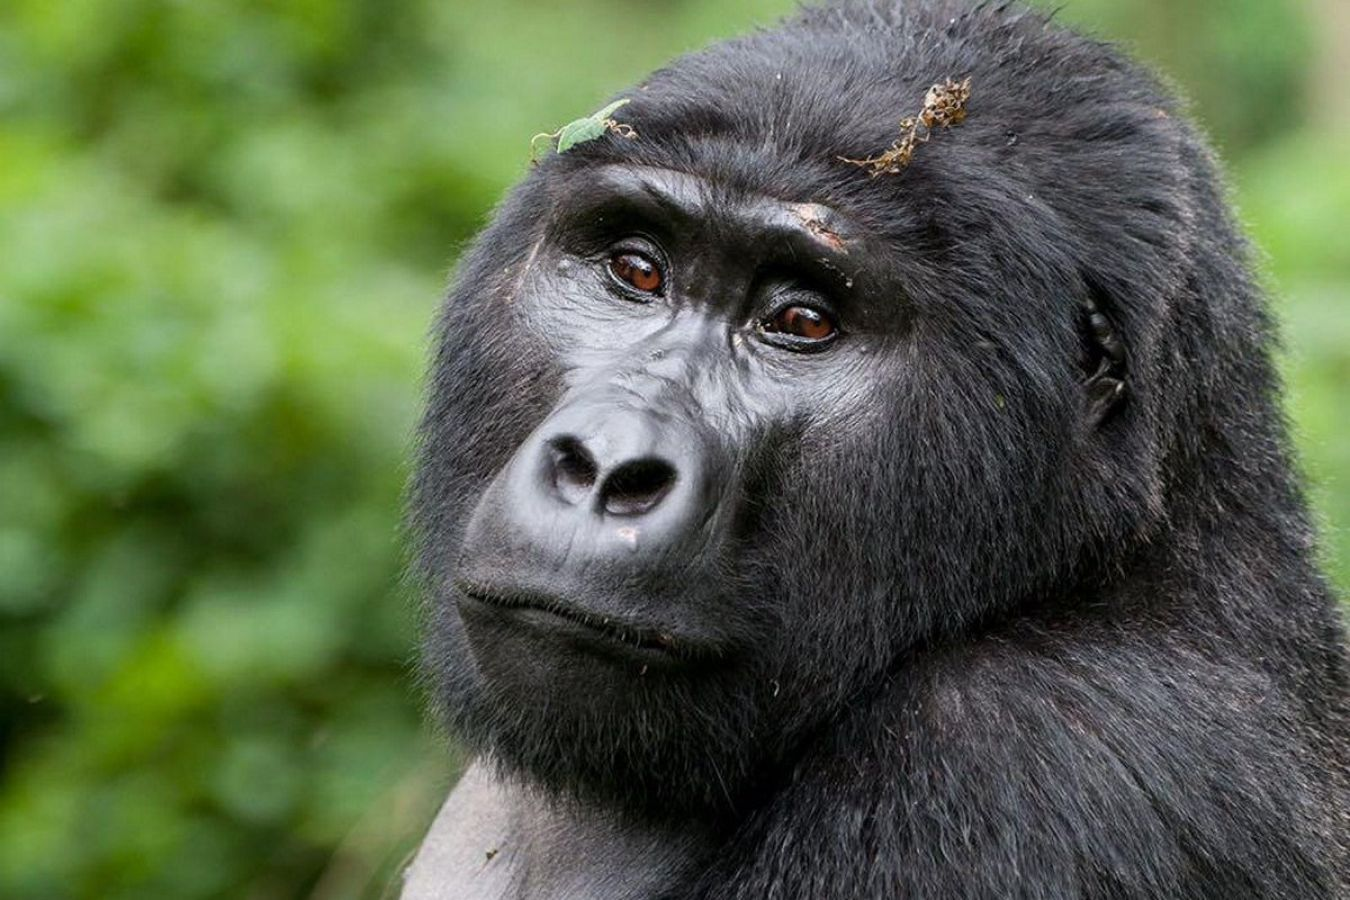 Berggorilla in Bwindi Impenetrable National Park